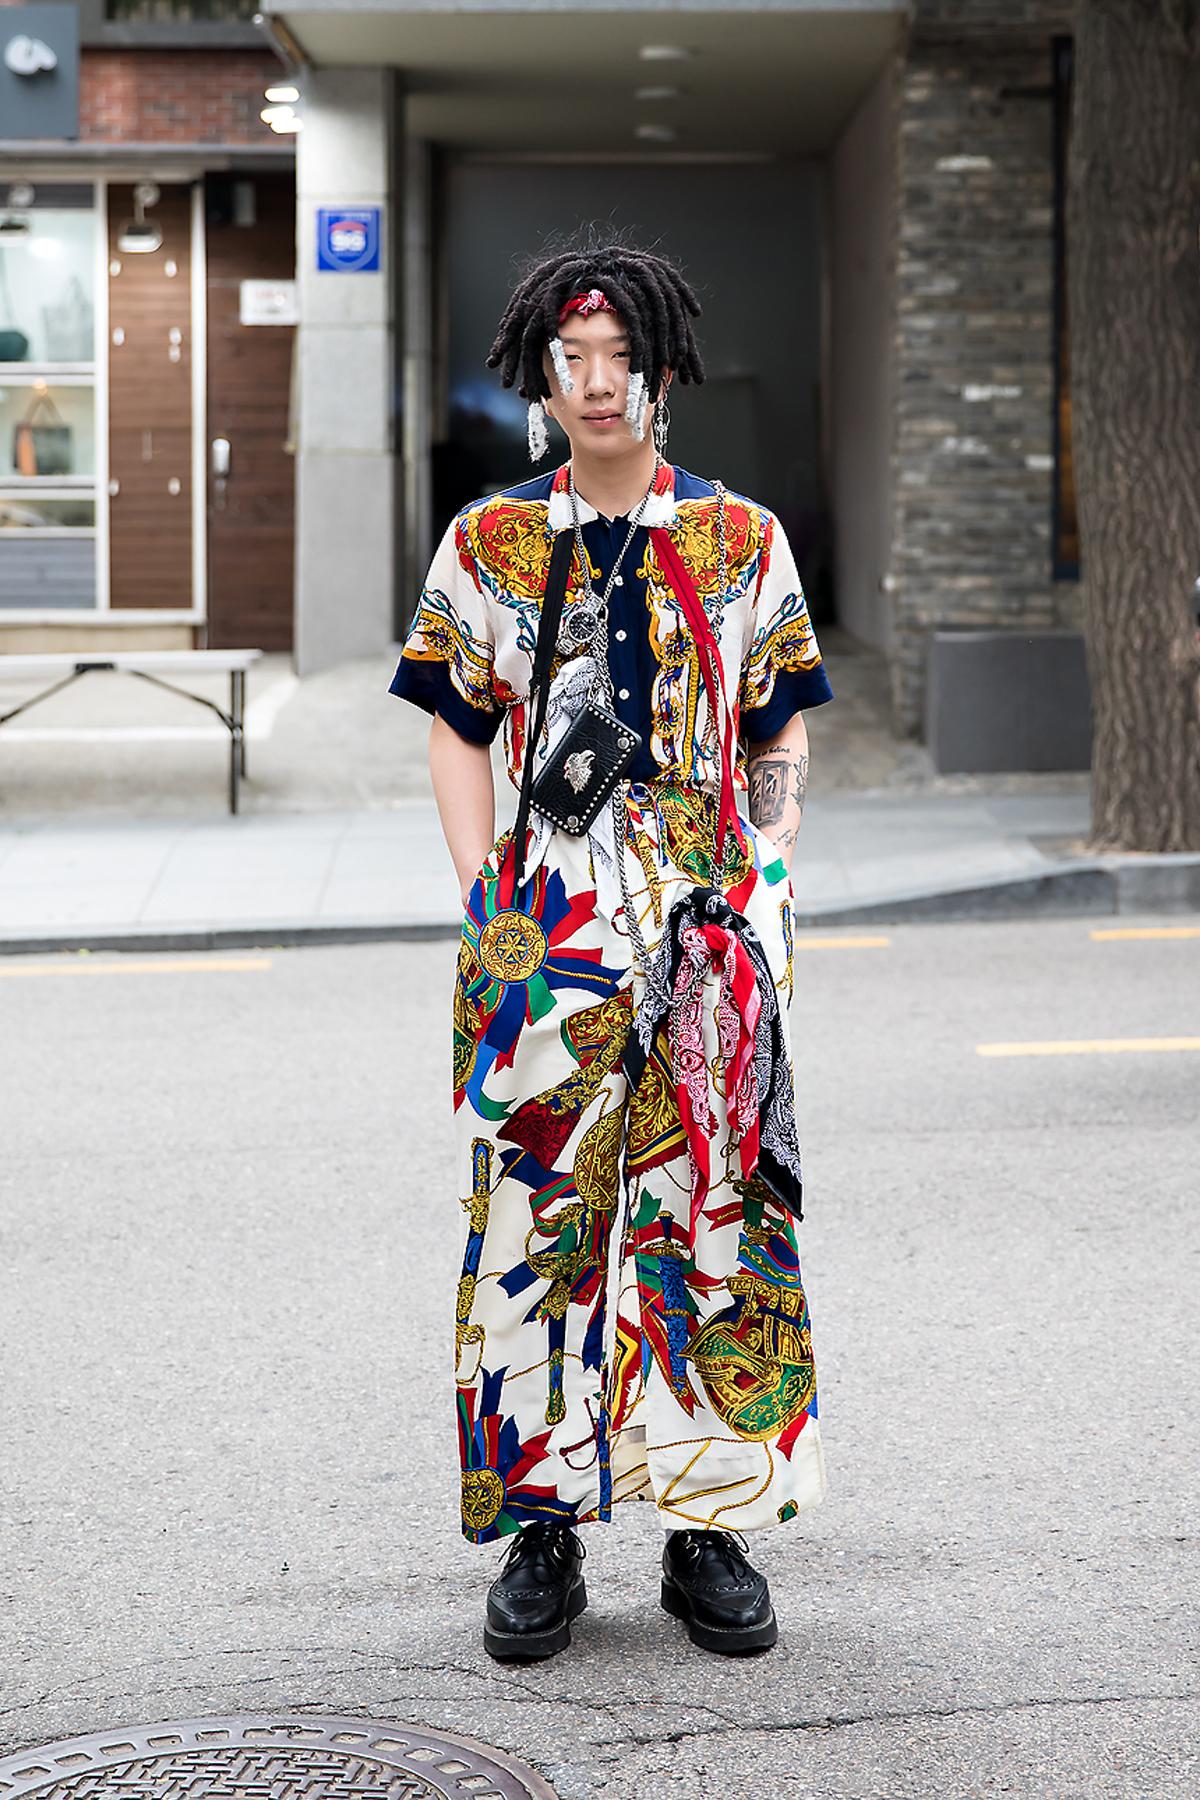 Jung Sayoon, Street Fashion 2017 in Seou..jpg